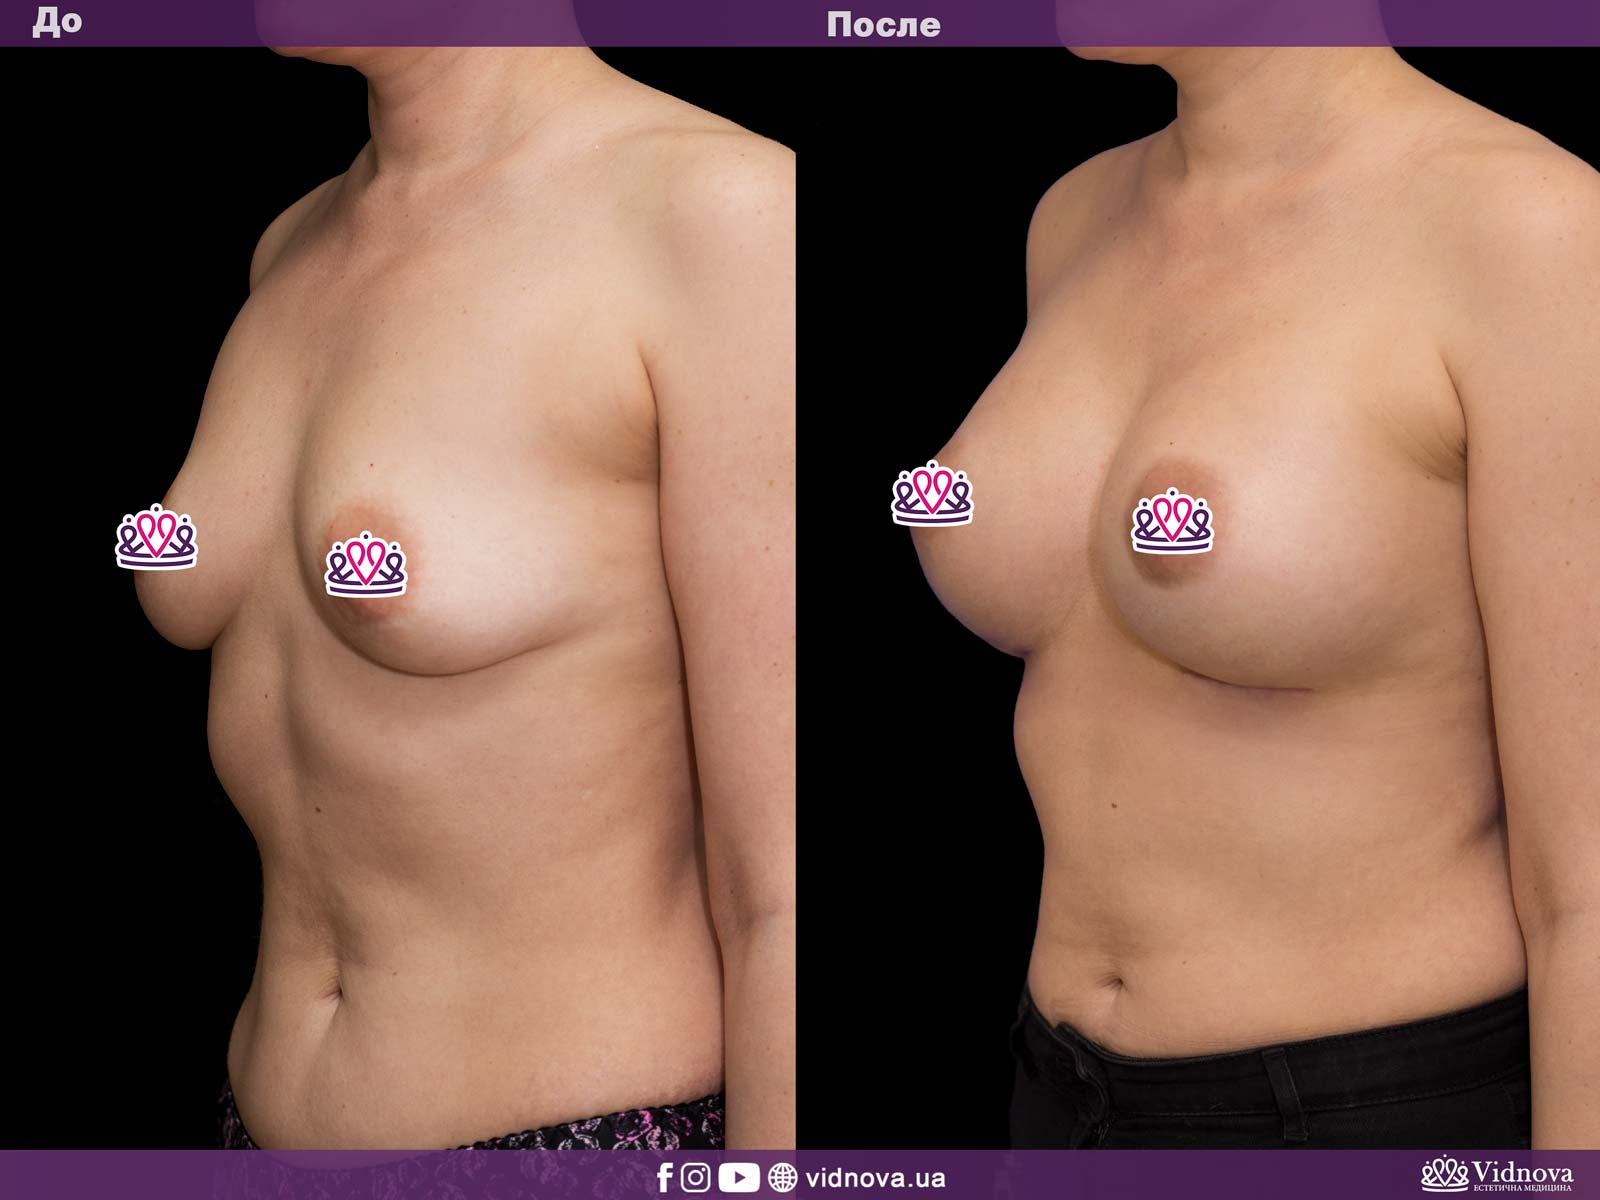 Увеличение груди: Фото ДО и ПОСЛЕ - Пример №30-2 - Клиника Vidnova